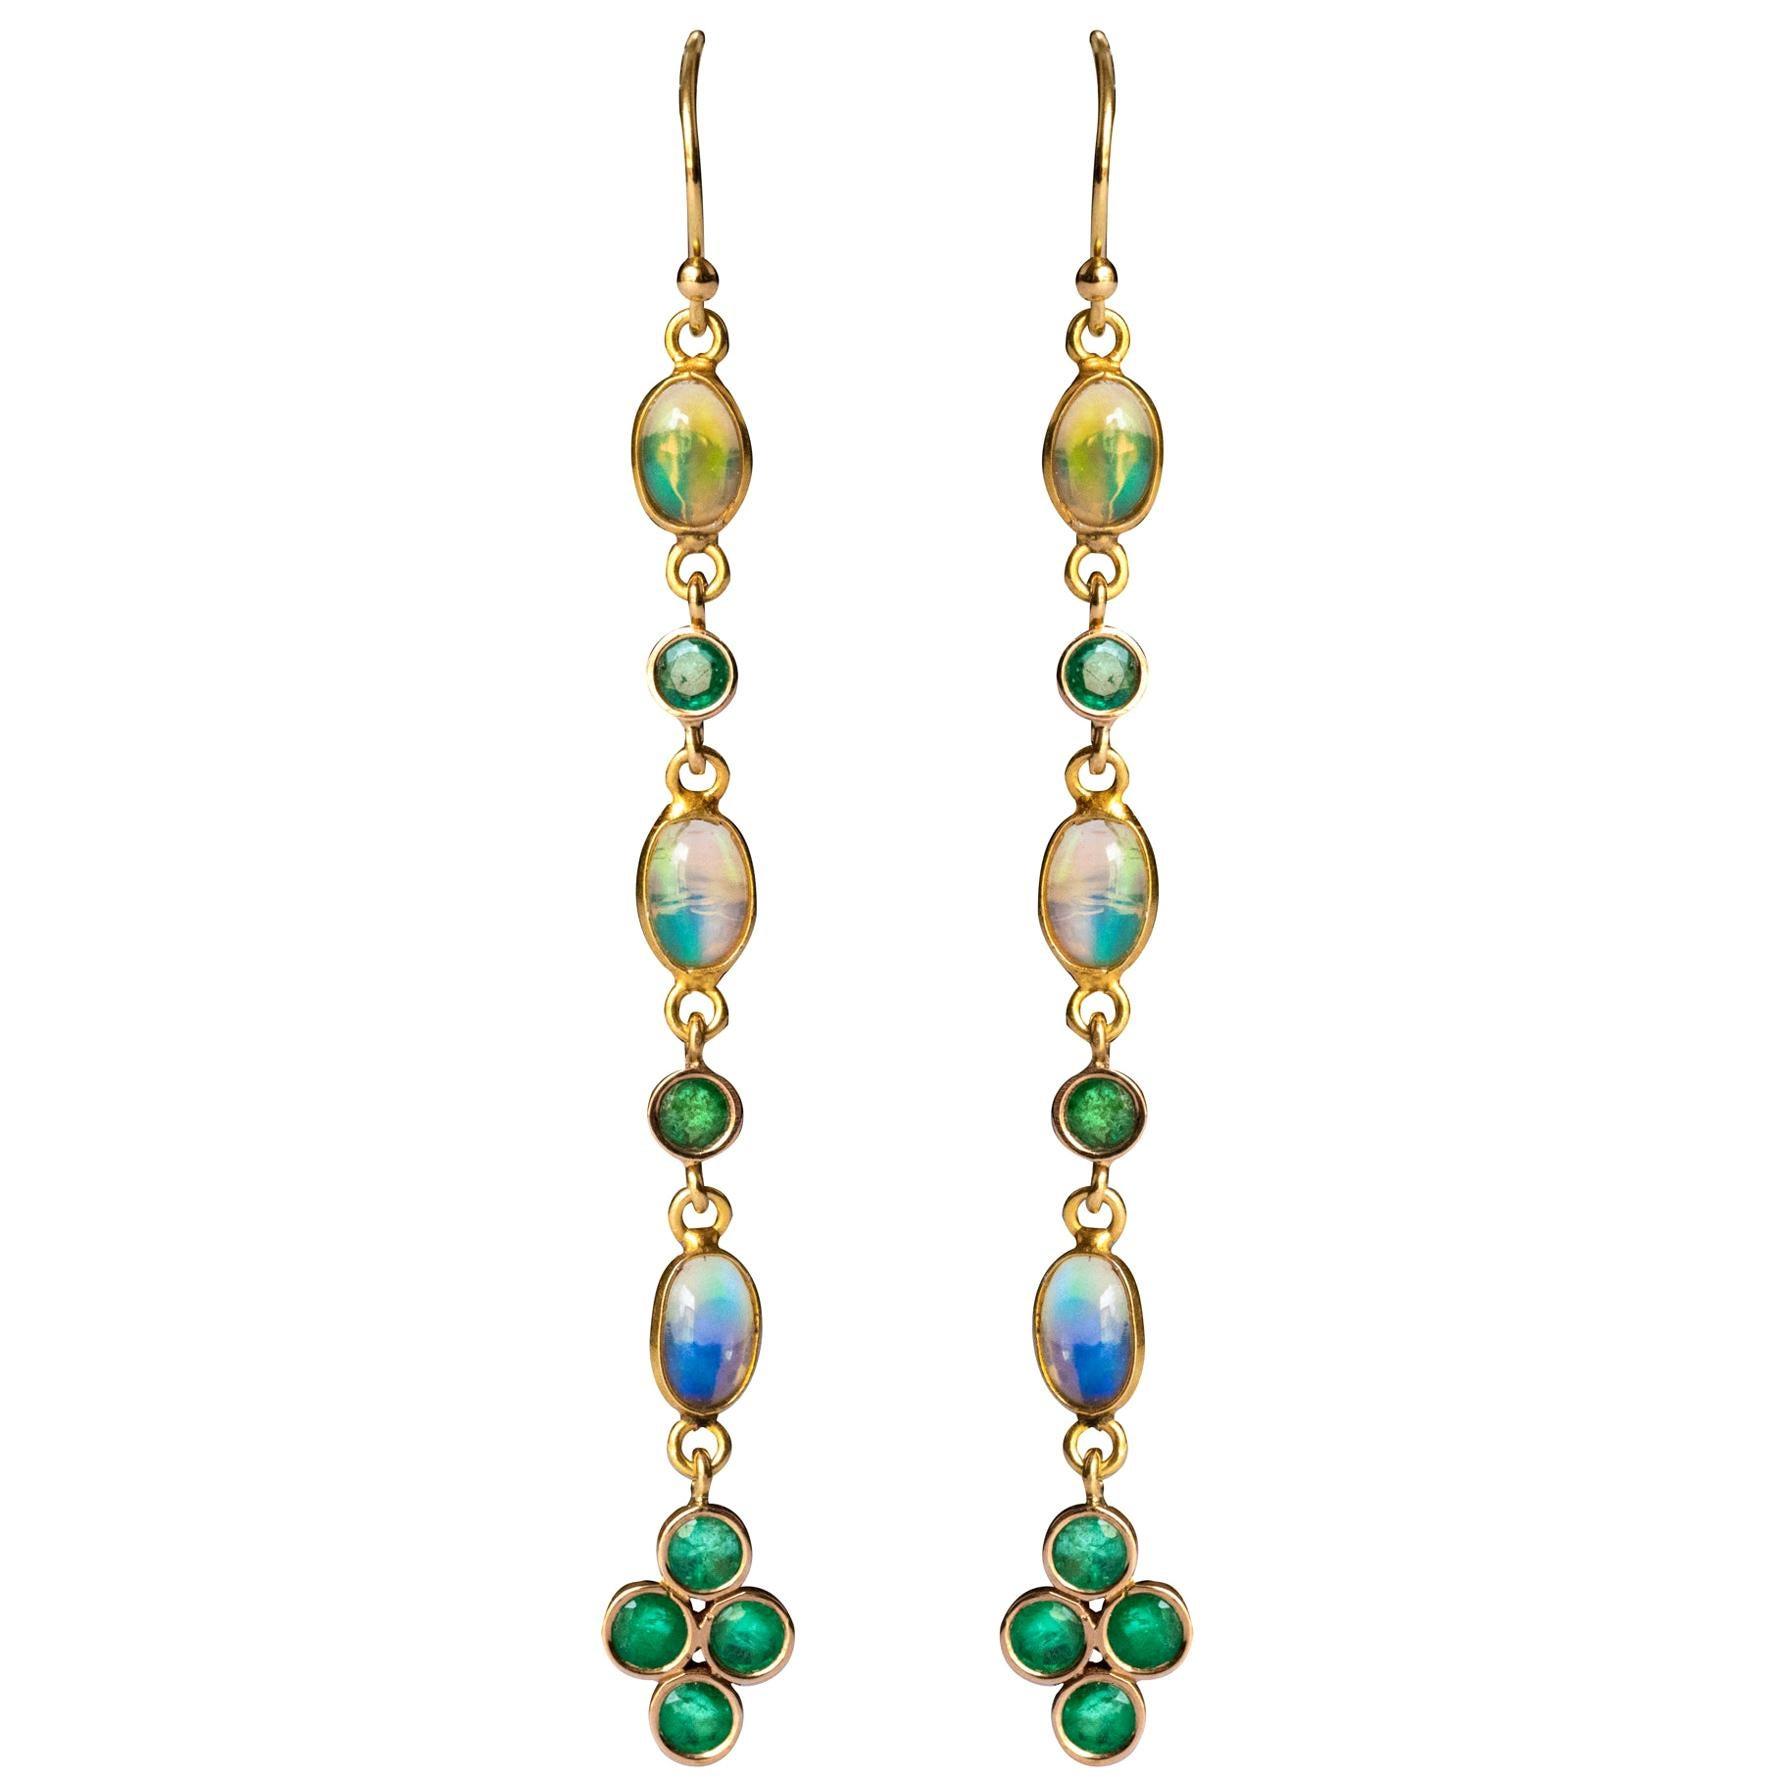 Baume 0.84 Carat Emeralds Opals 18 Karat Yellow Gold Dangle Earrings